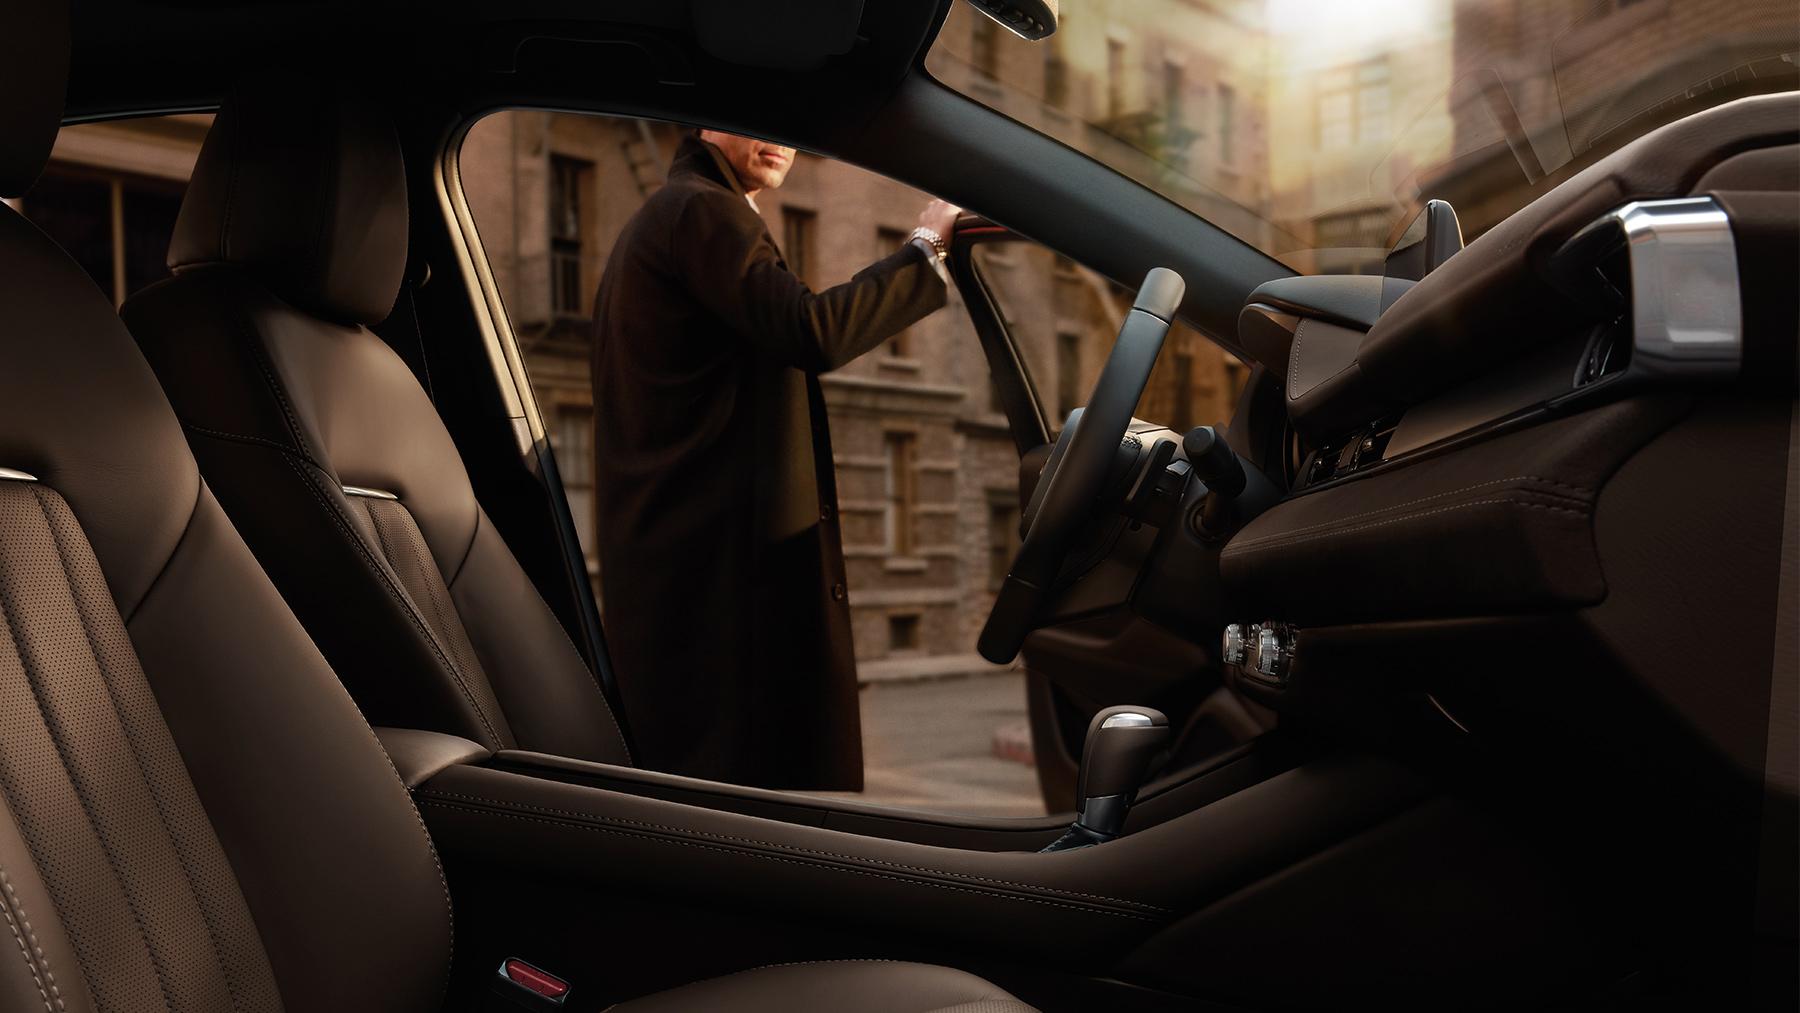 2019 Mazda 6 Interior Front